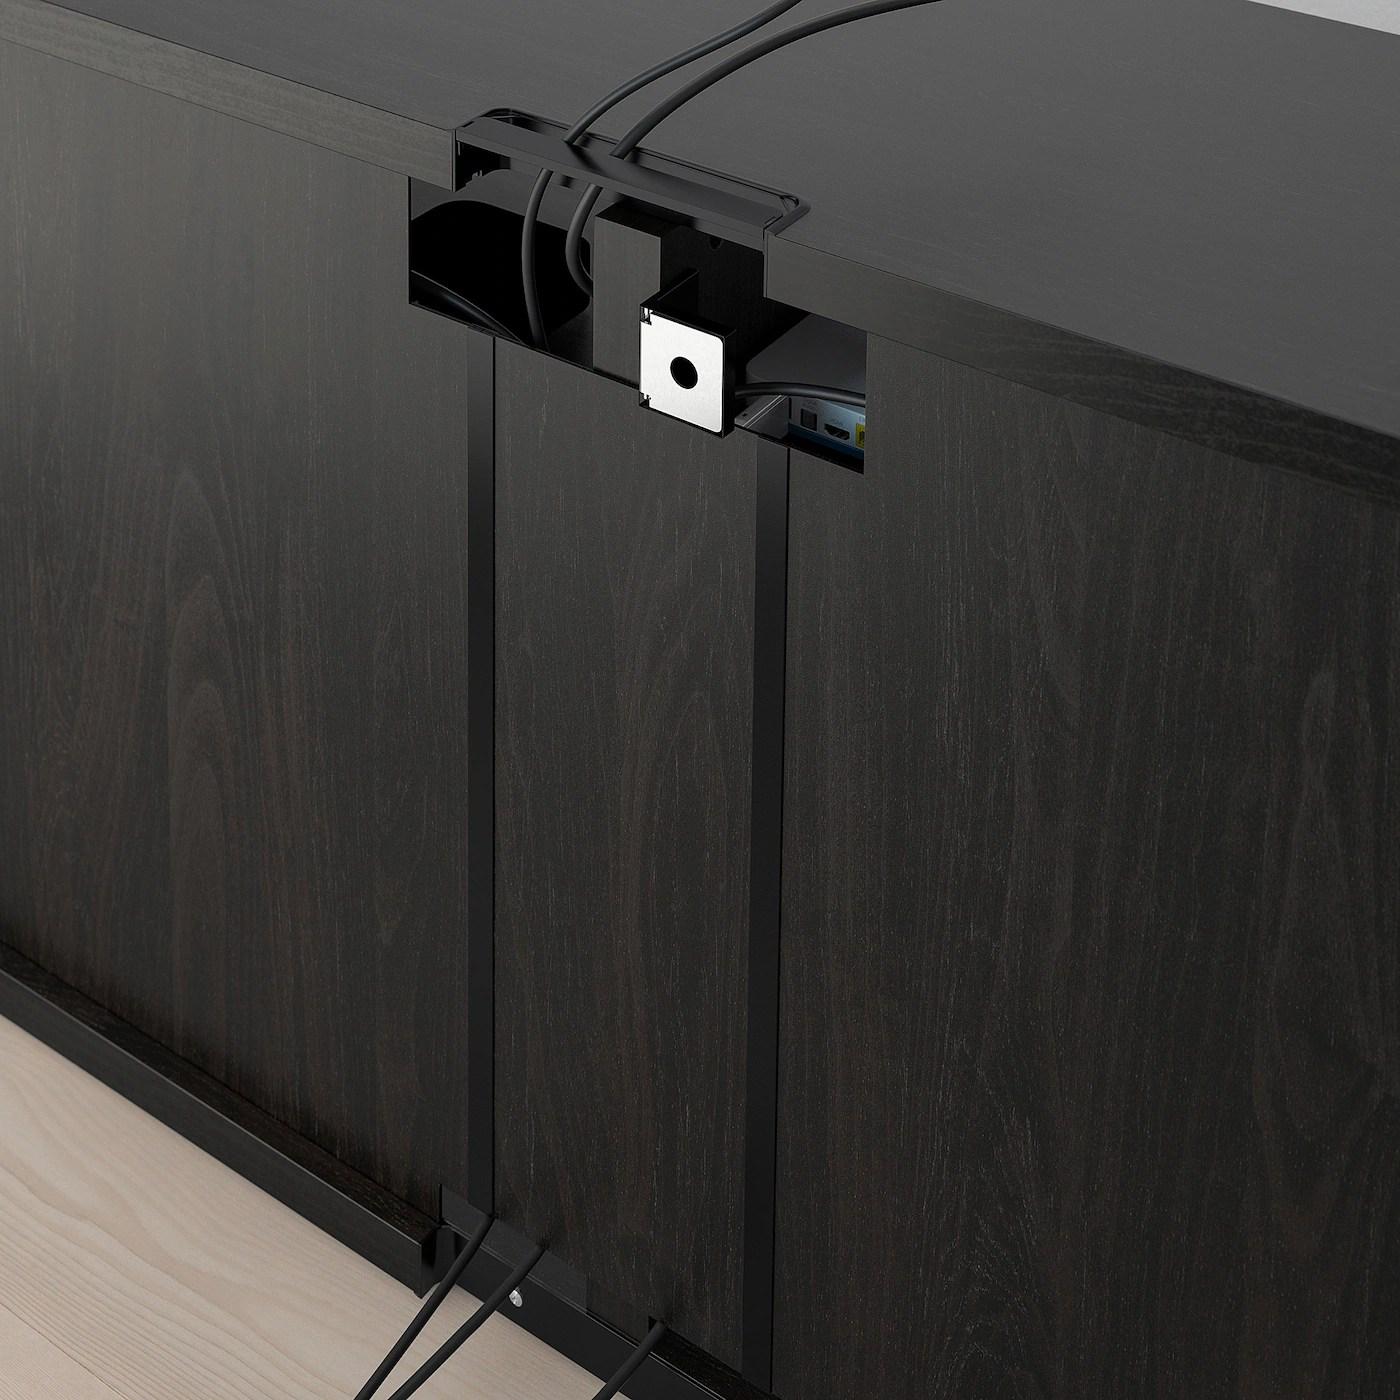 besta banc tv brun noir 120x40x64 cm